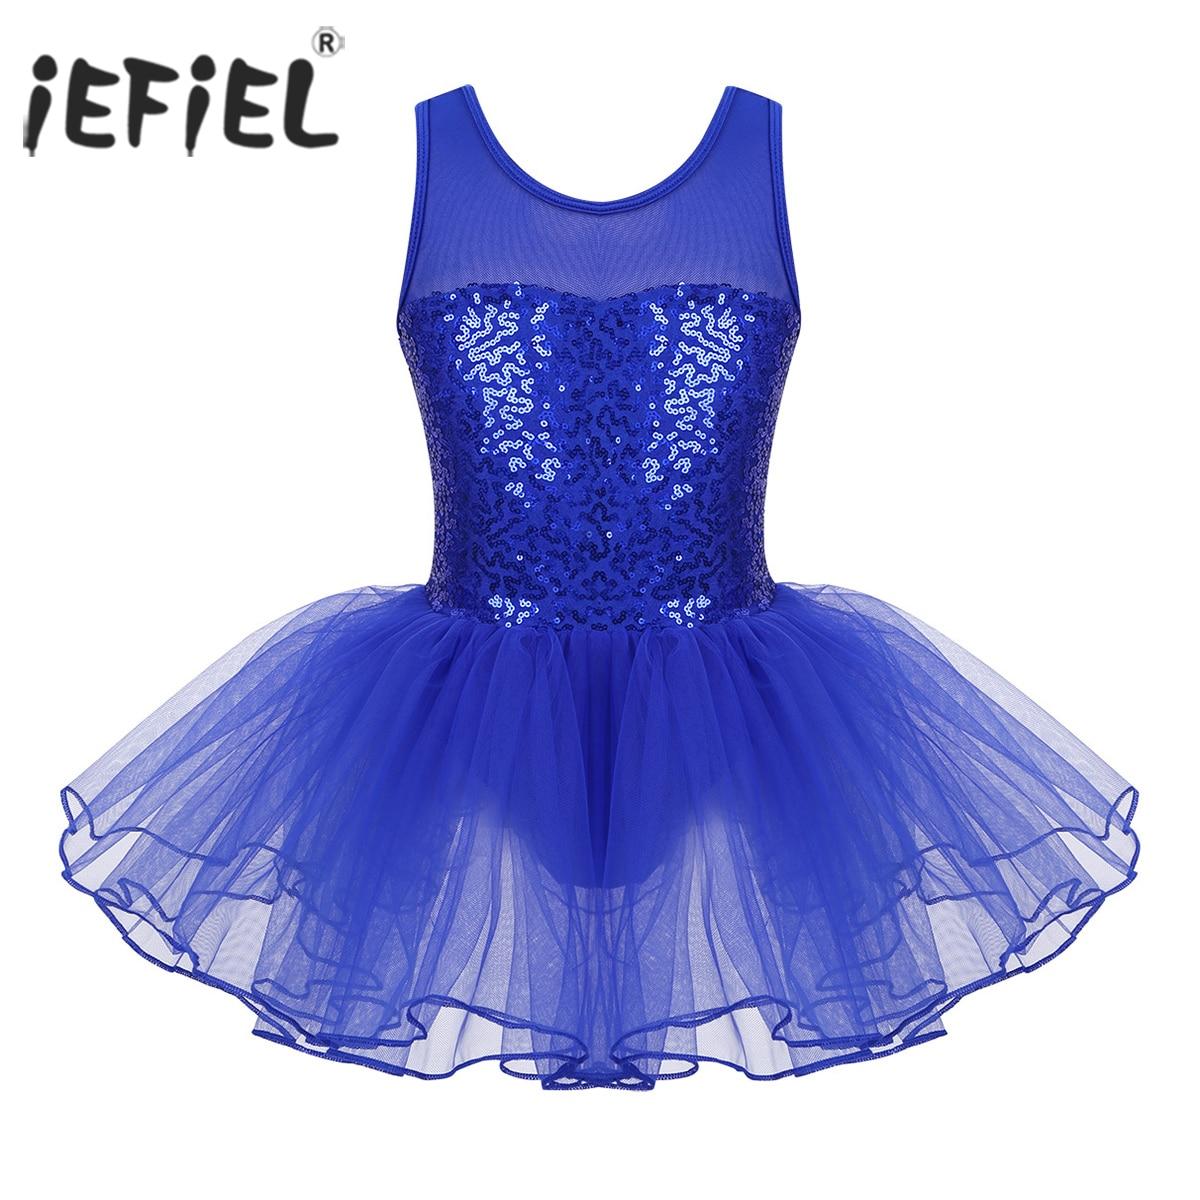 Kids Girls Ballet Gymnastics Mesh Leotard Lace Tutu Dress Dancewear Costume